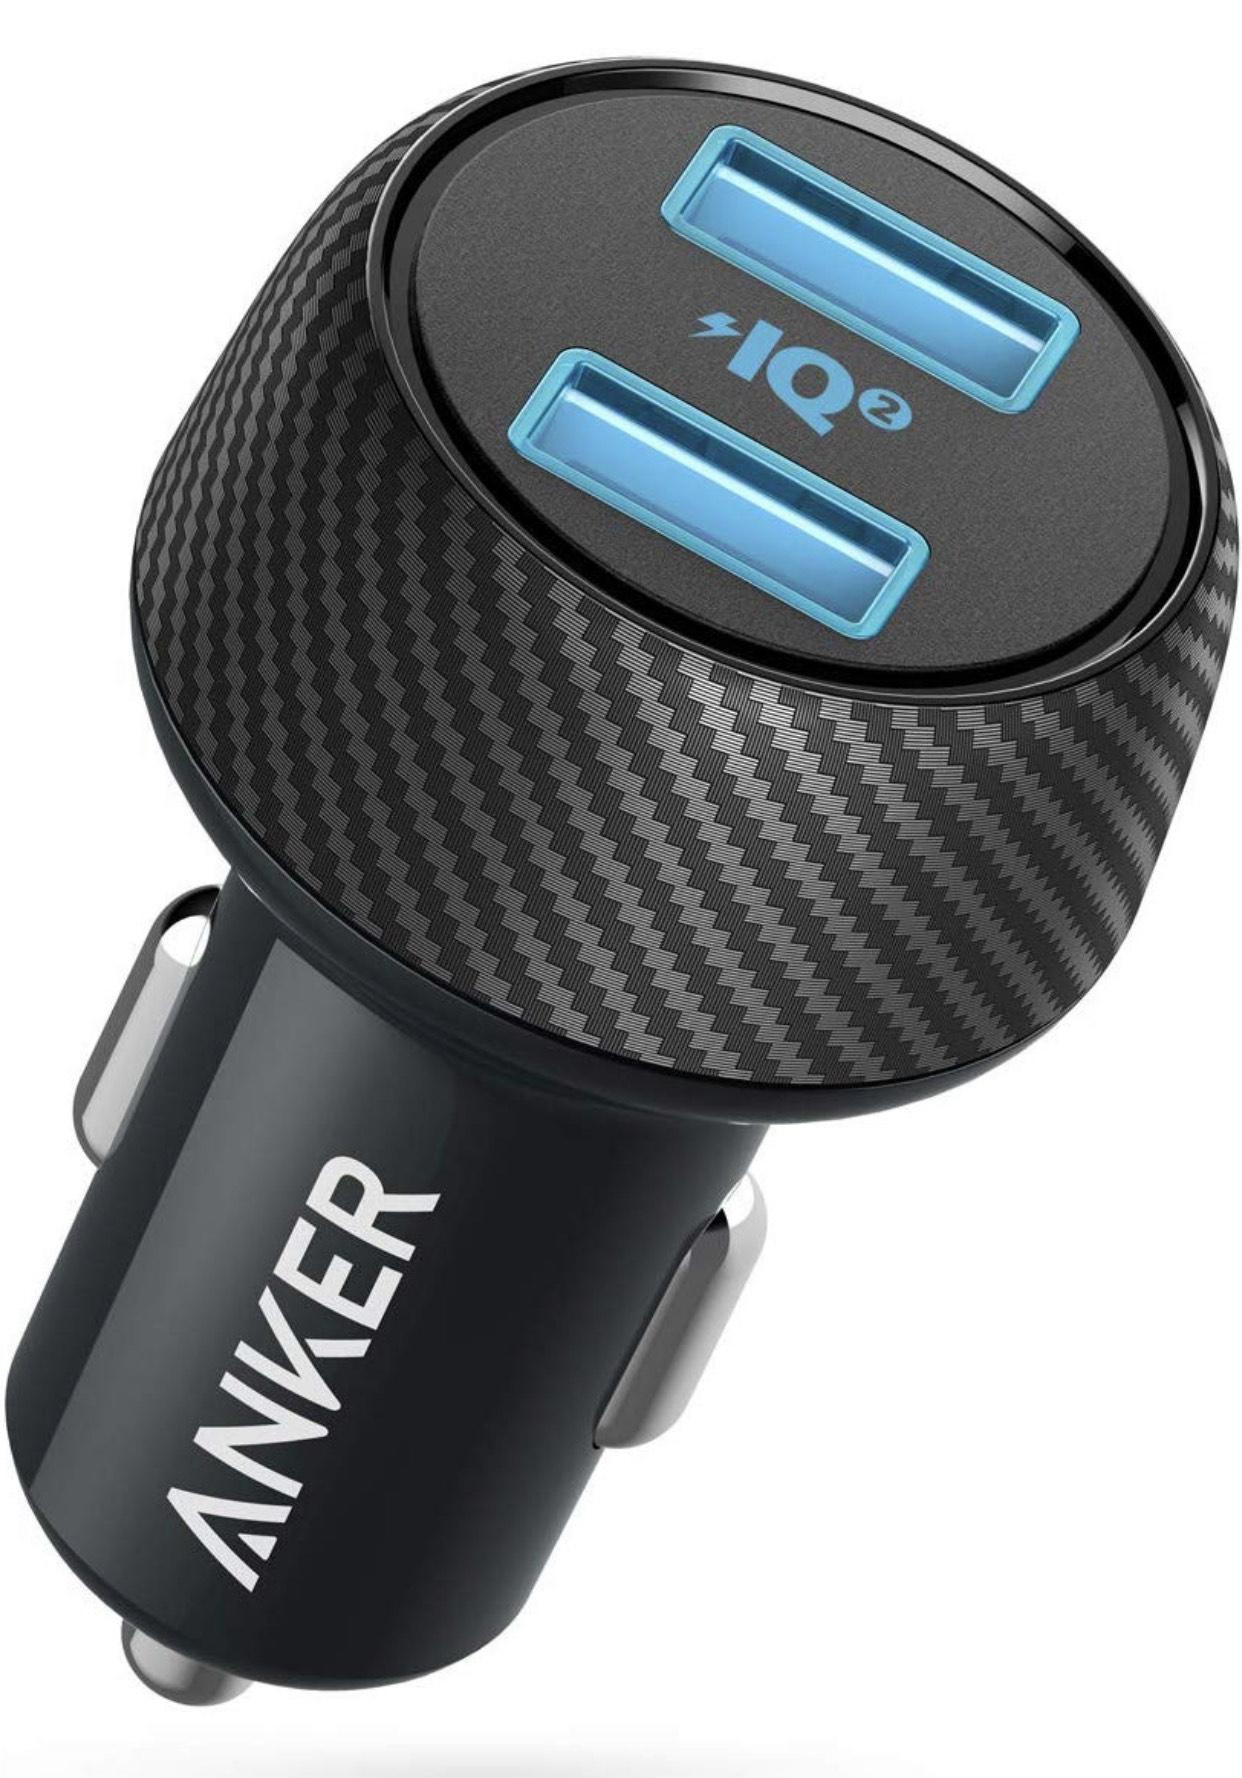 Anker Auto Ladegerät PowerDrive Speed 2 30W Dual Port USB Ladegerät mit PowerIQ 2.0